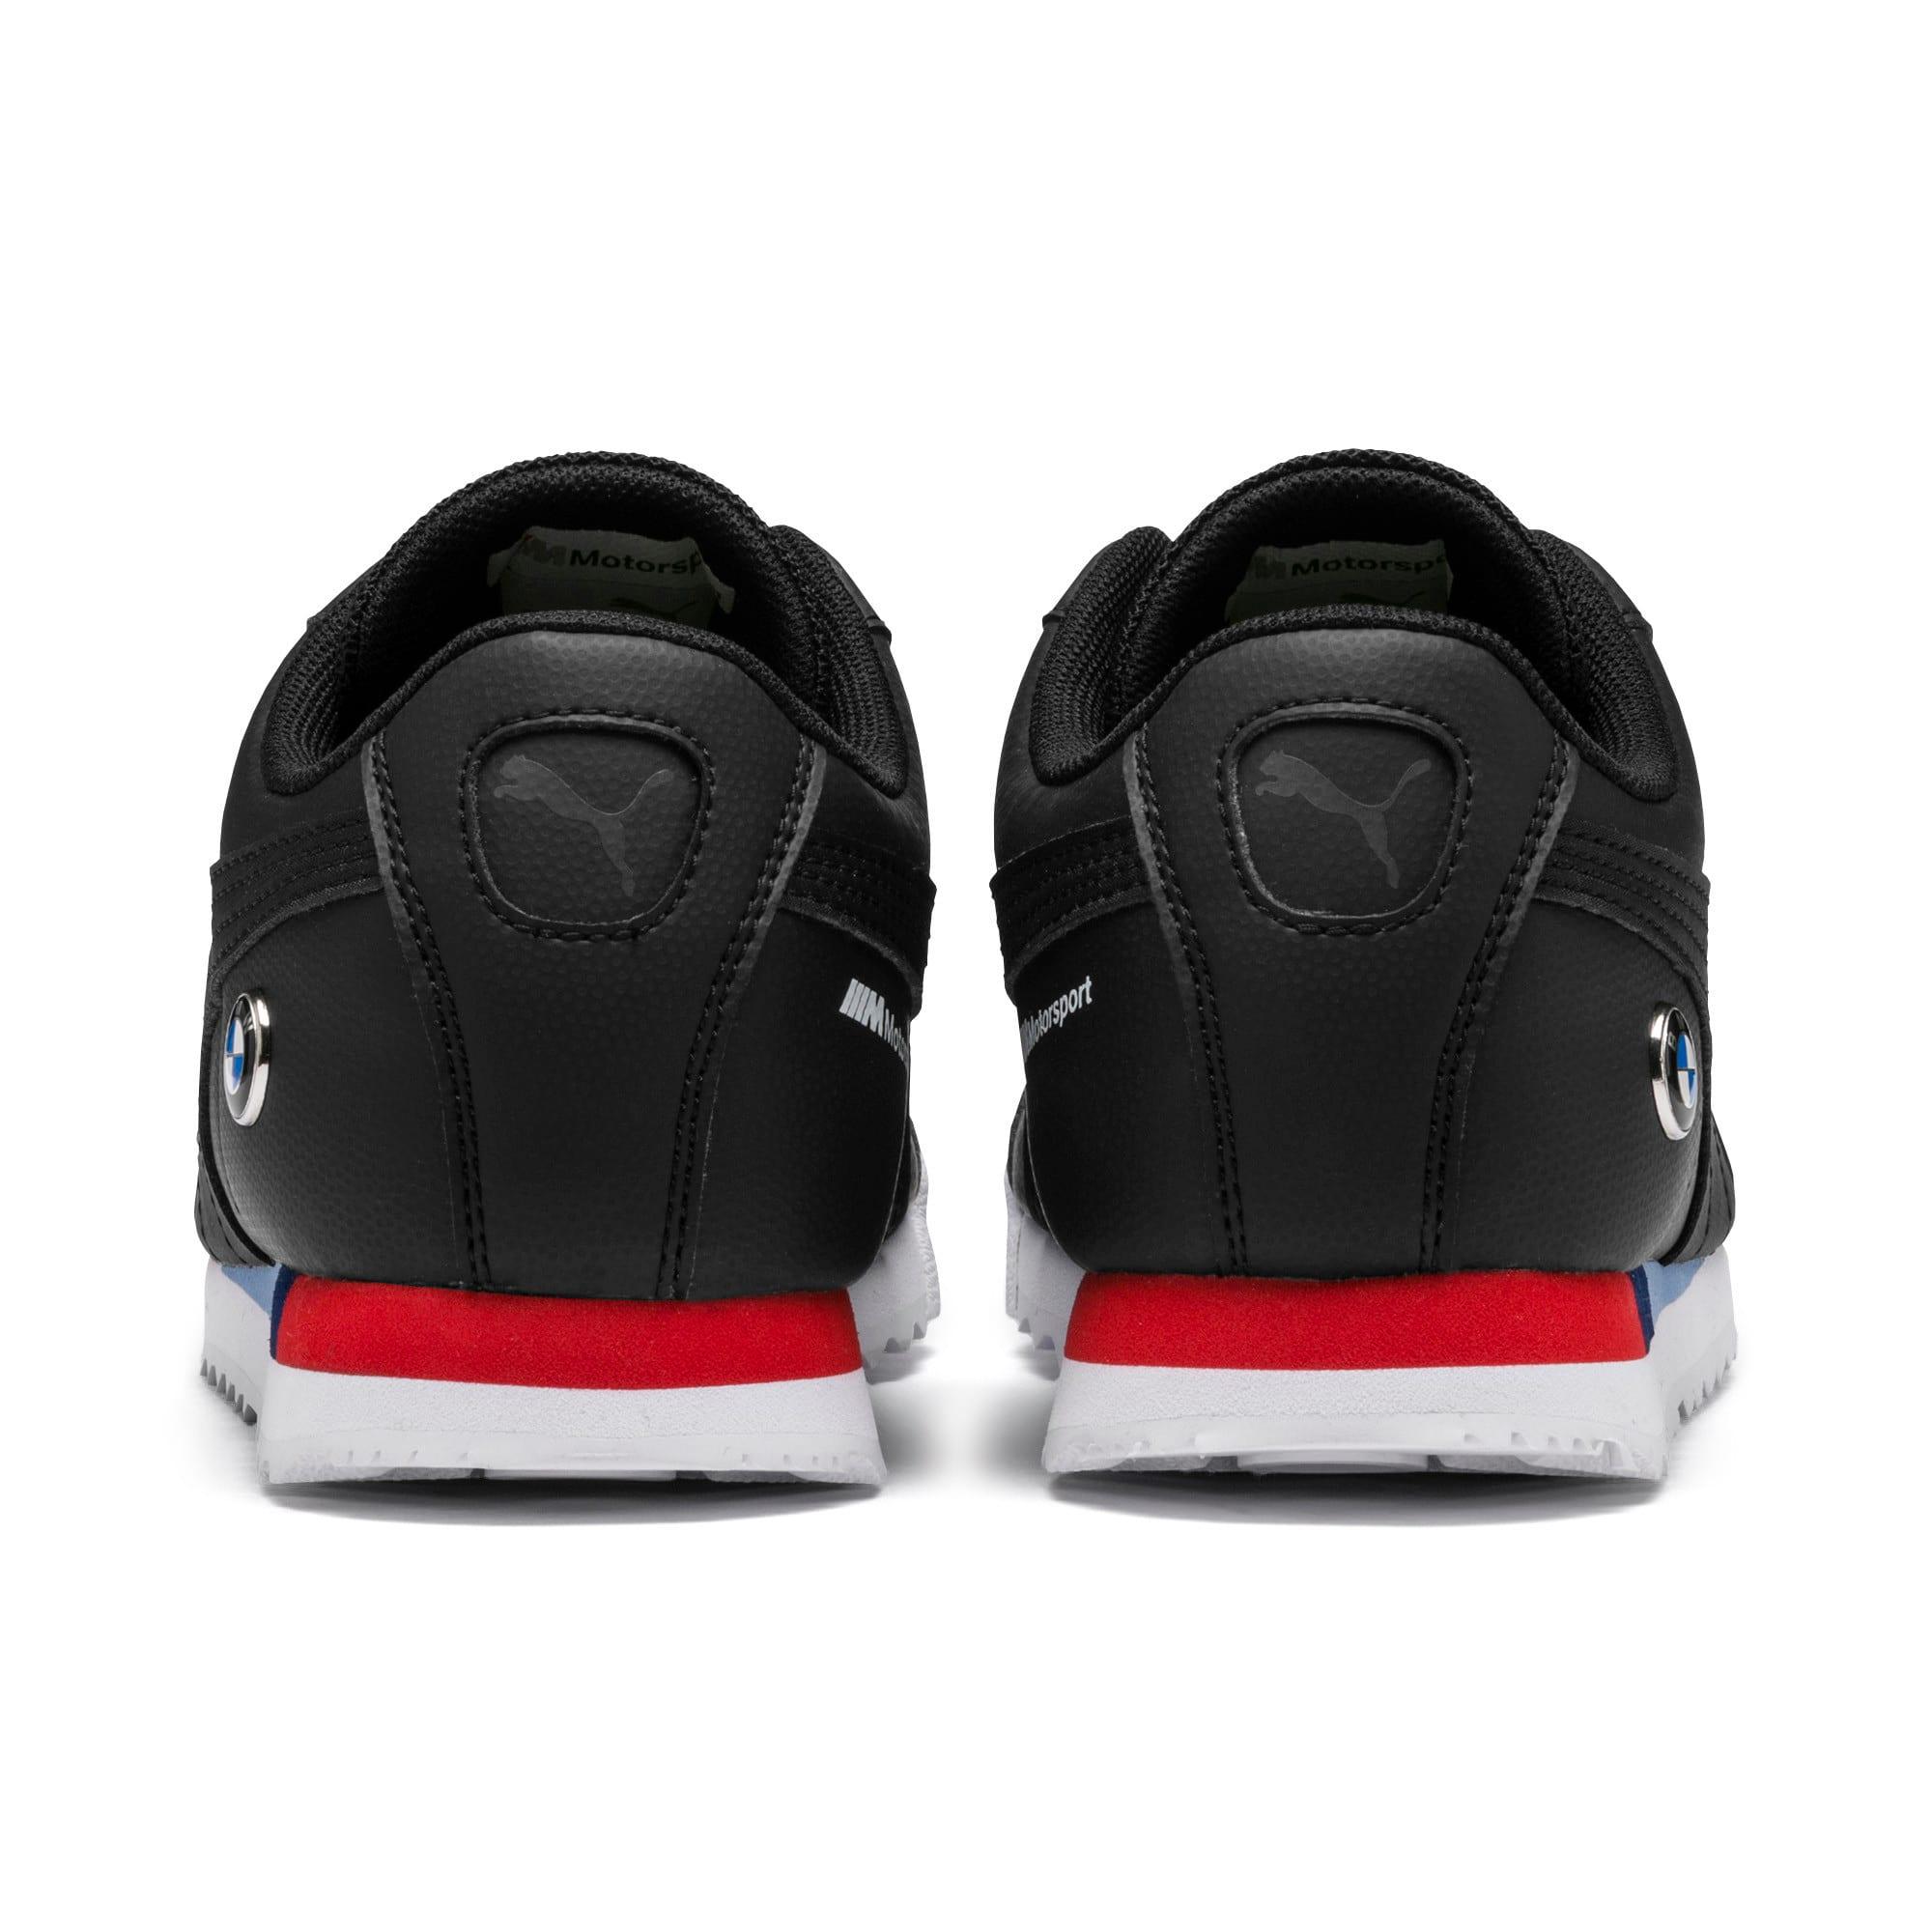 Thumbnail 3 of BMW M Motorsport Roma Sneakers JR, Puma Black-Puma Black, medium